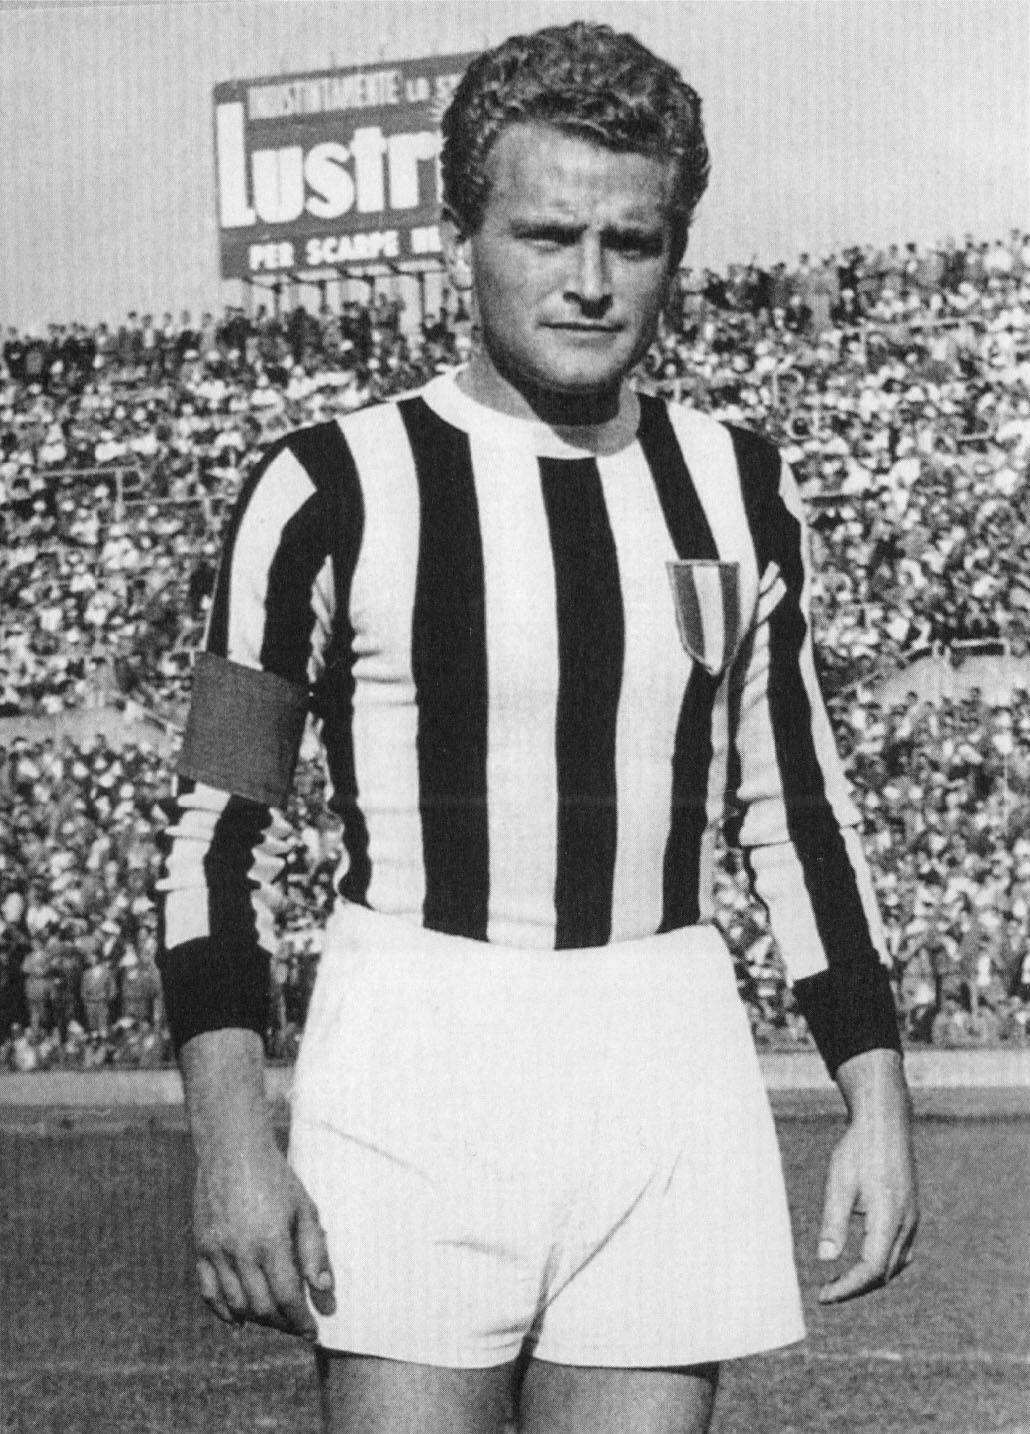 Giampiero_Boniperti,_Juventus.jpg